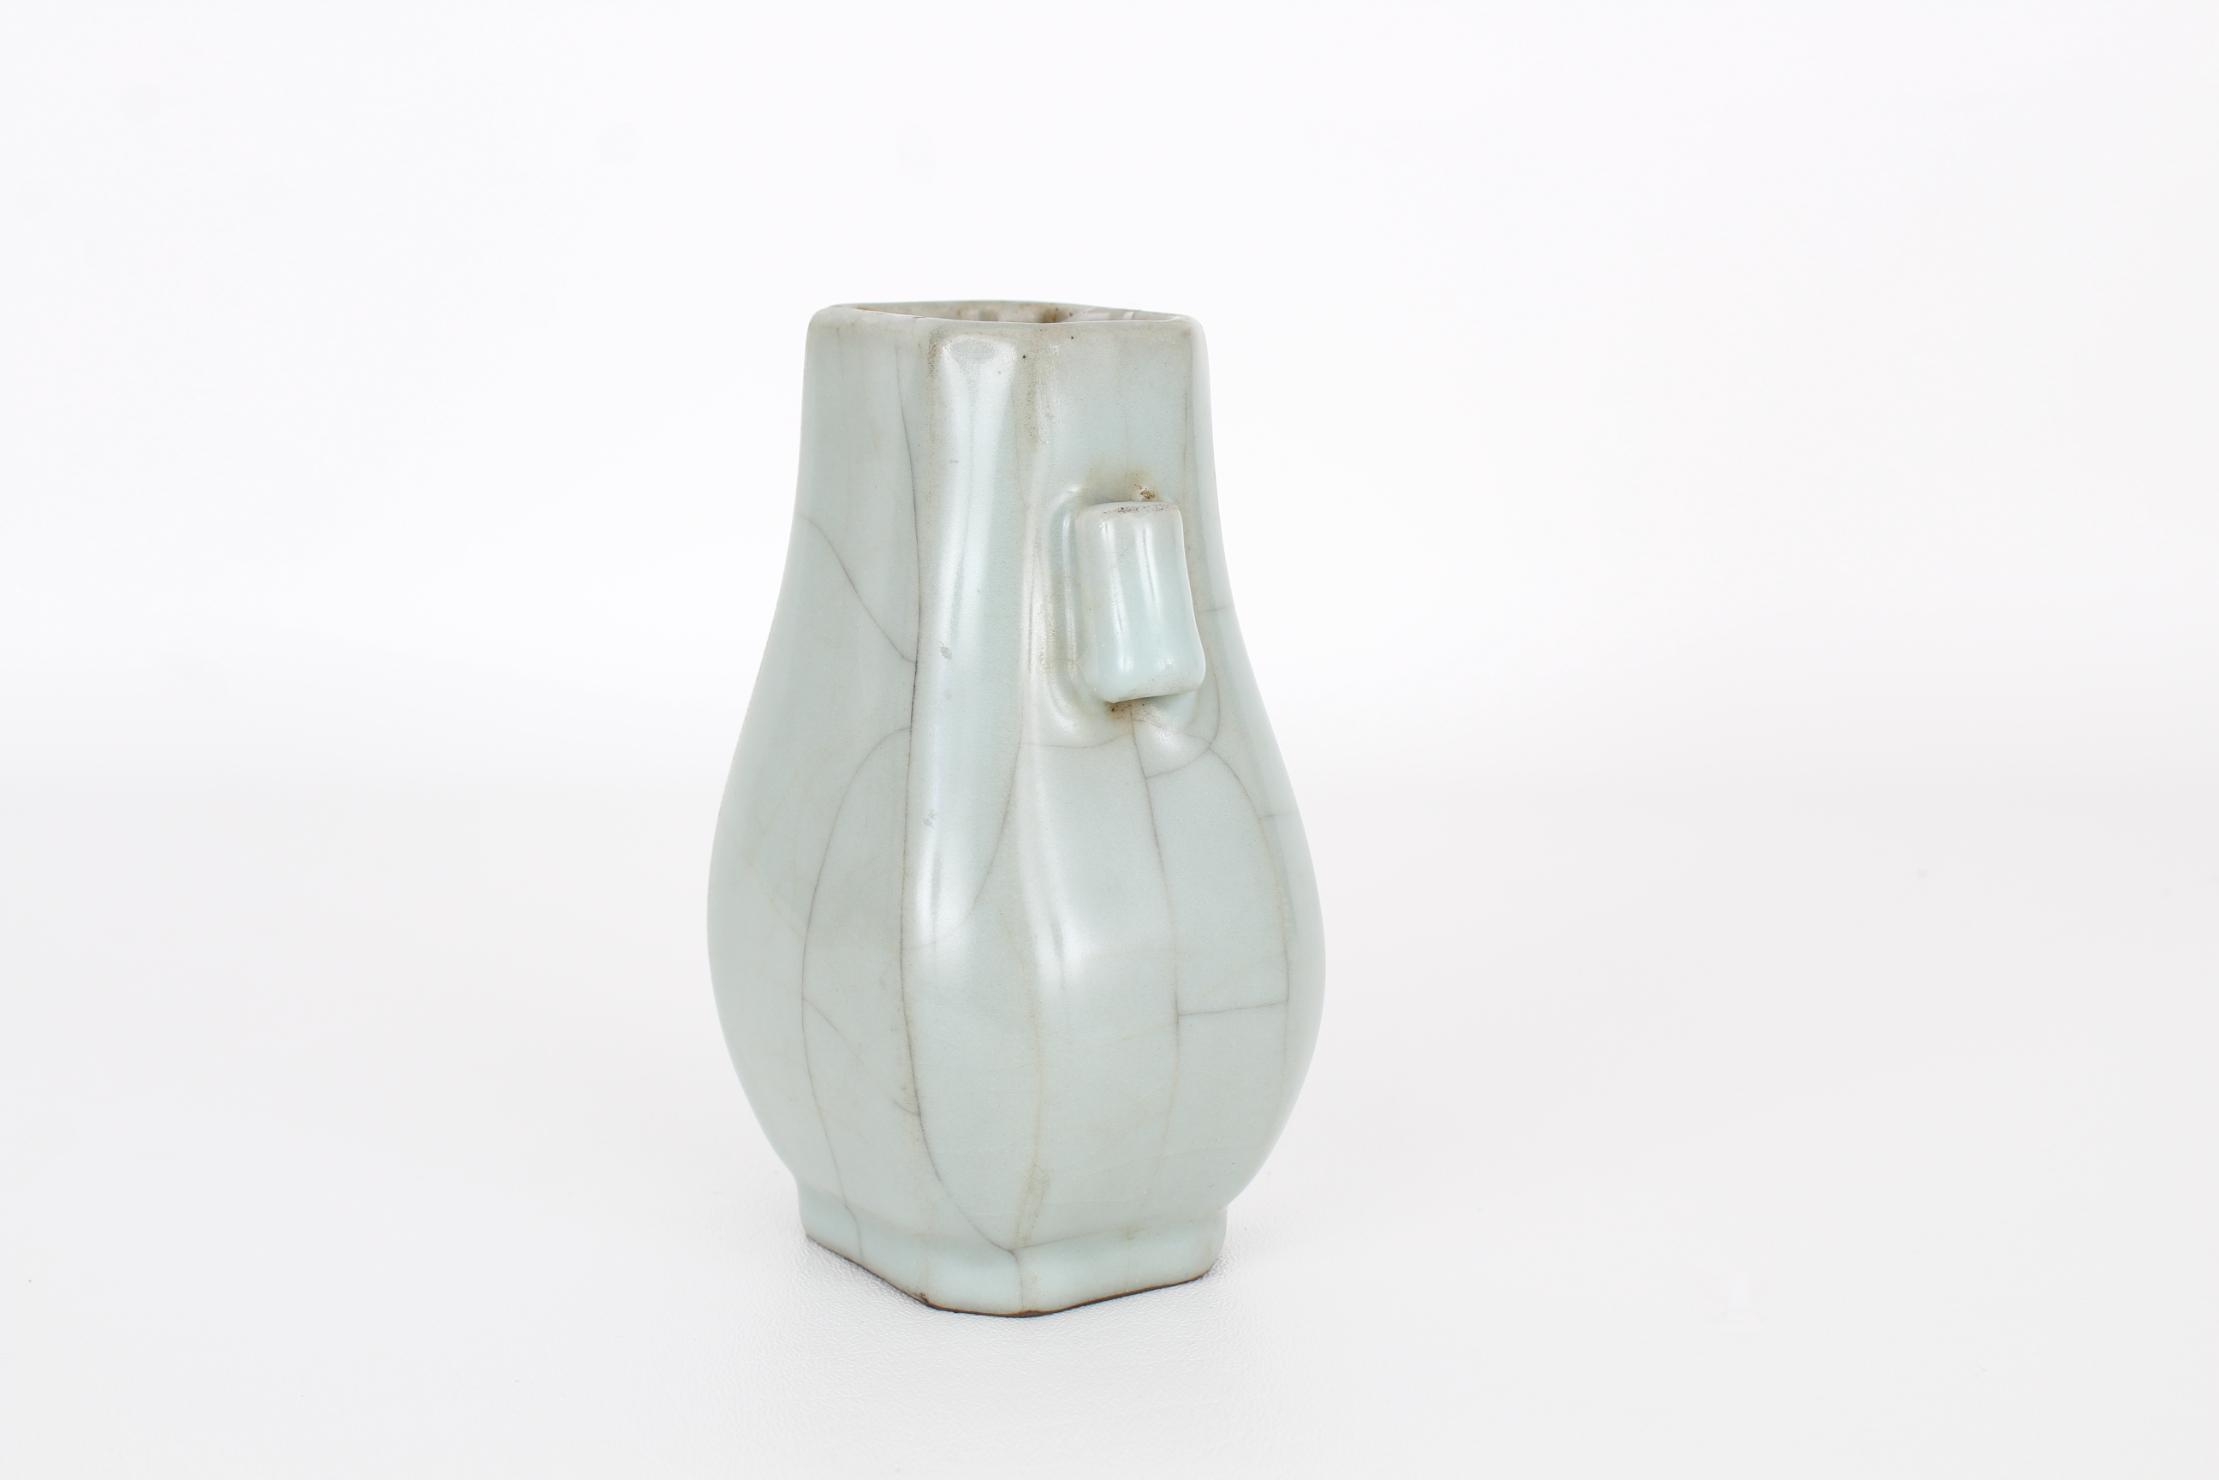 Chinese Guan-Type Vase, Qianlong Mark - Image 2 of 5